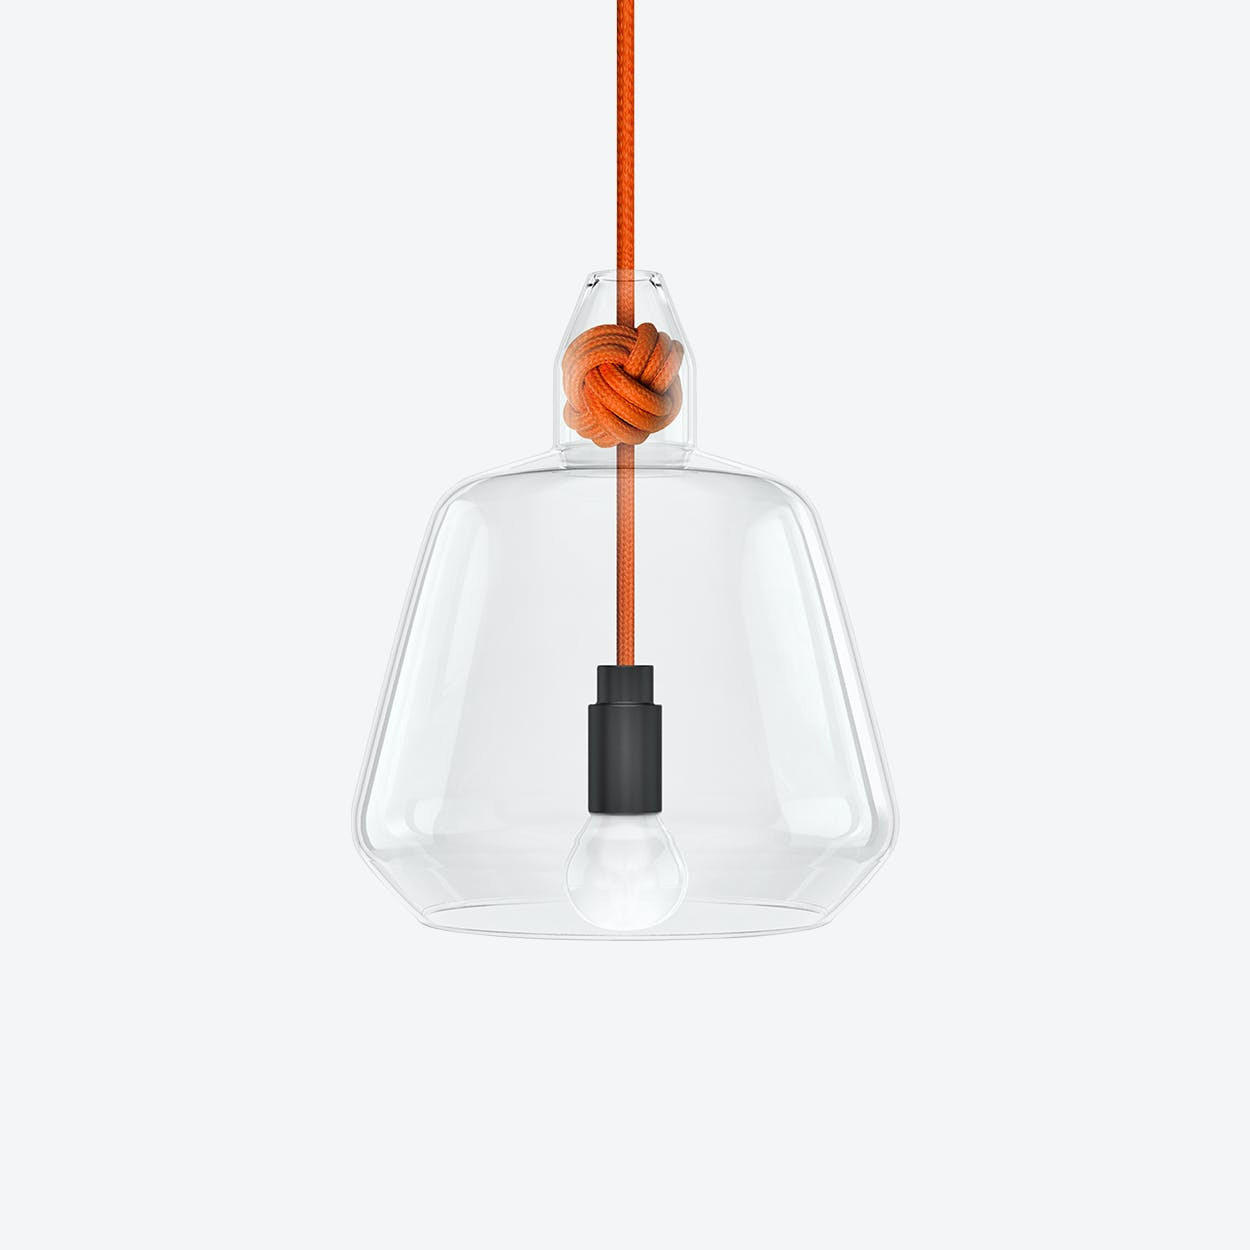 Large Knot Pendant Light in Orange